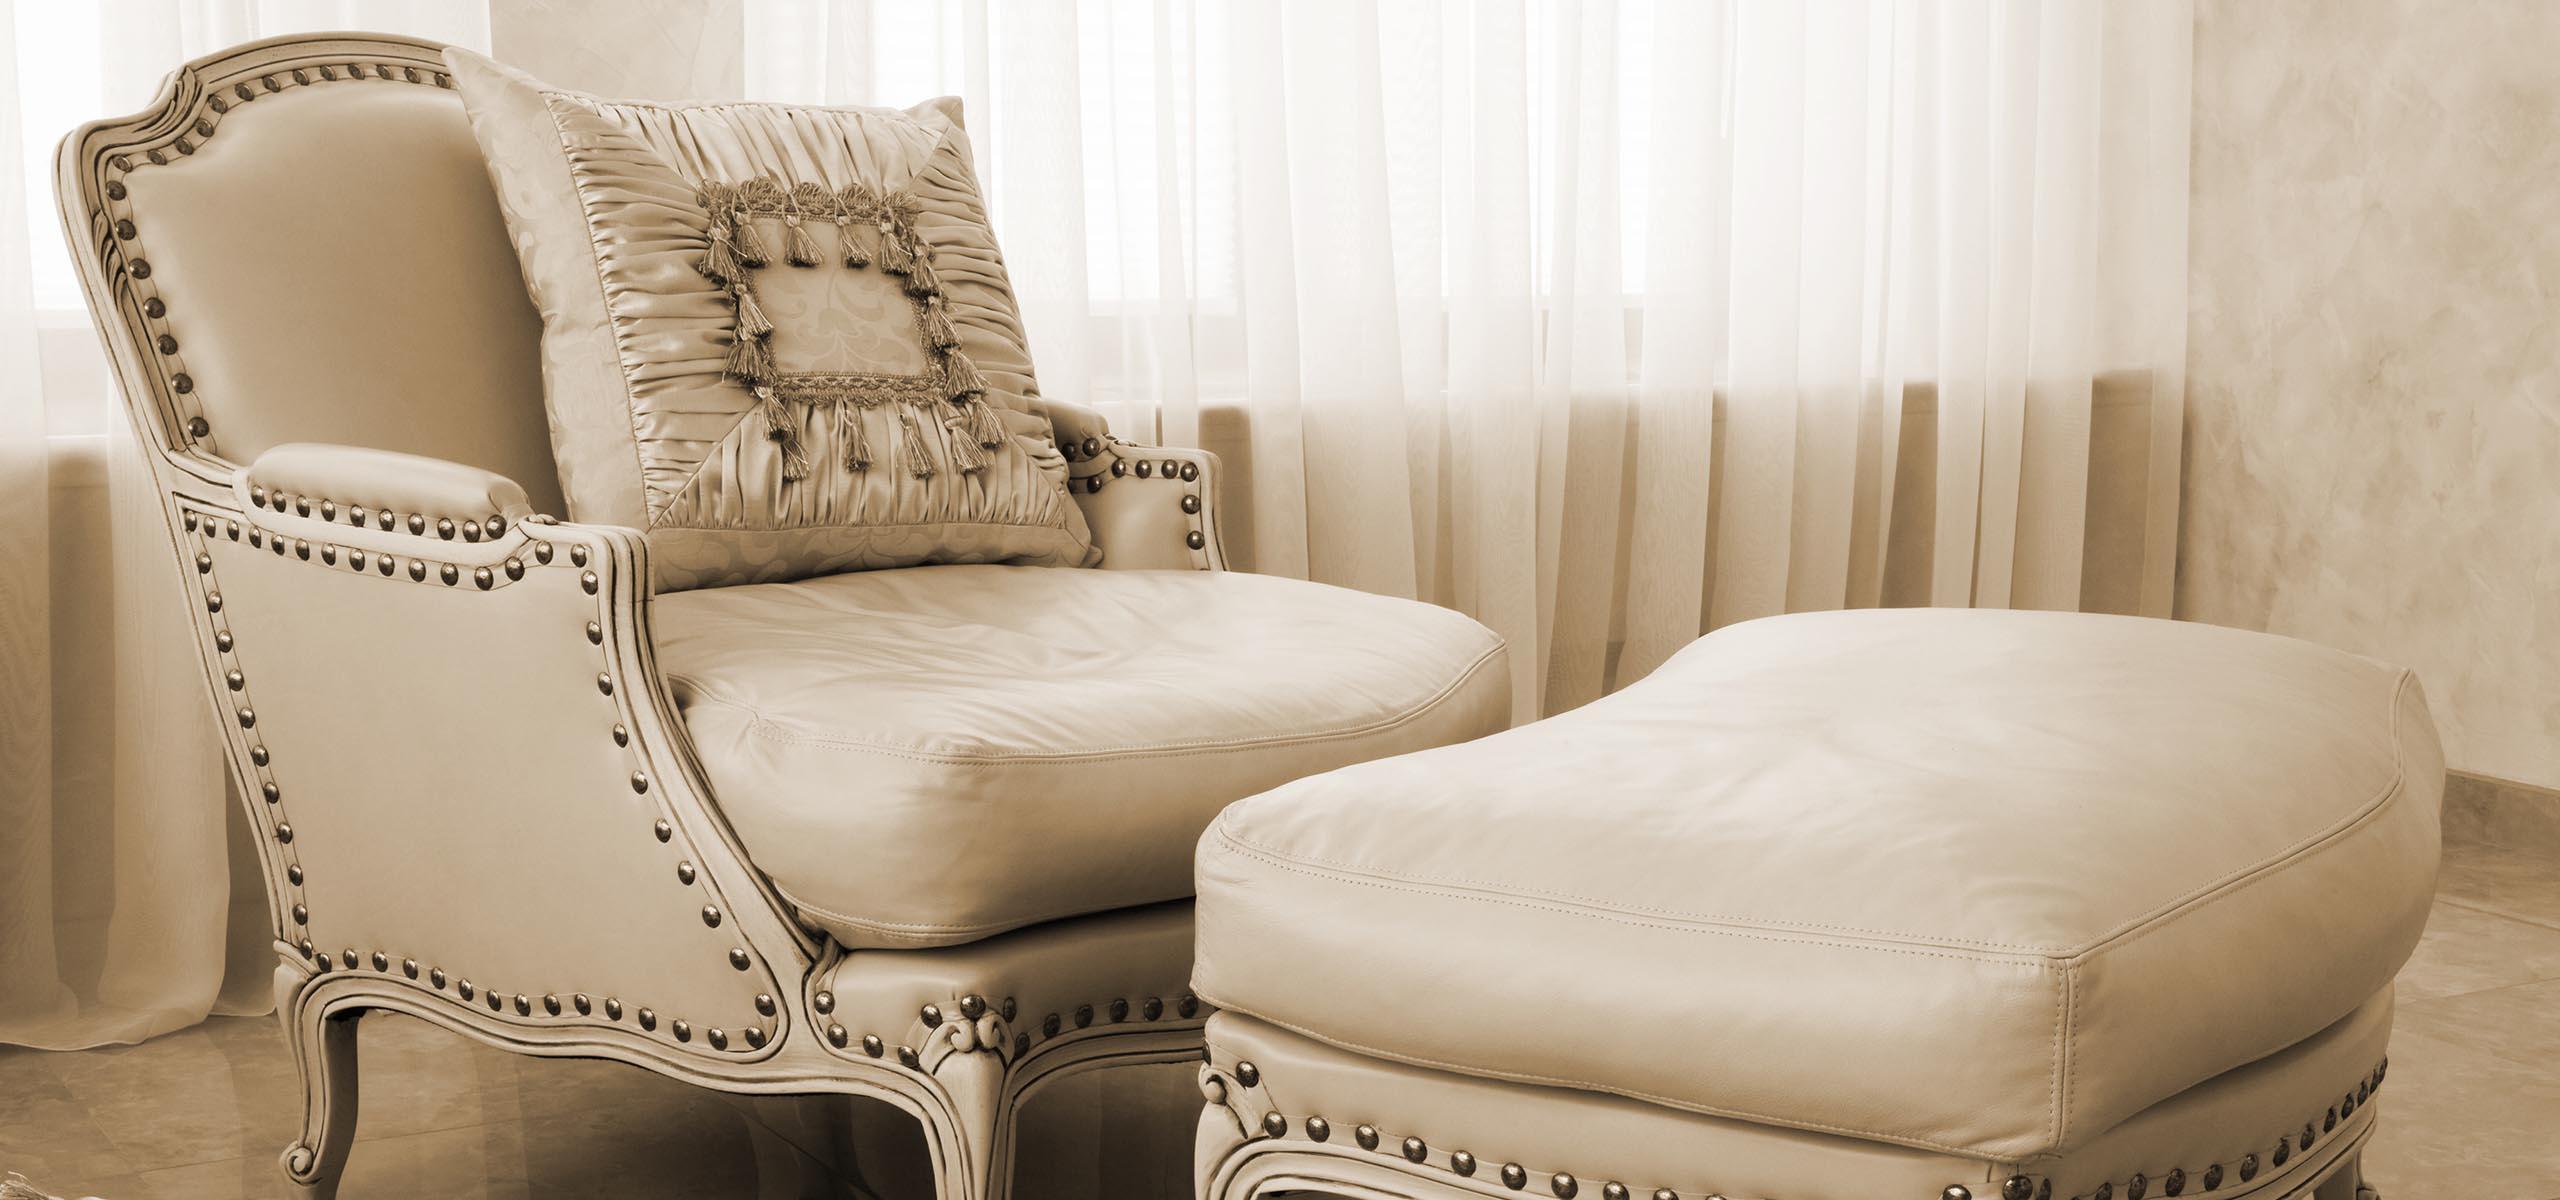 Joseph Aaron Furniture Restoration & French Polishing